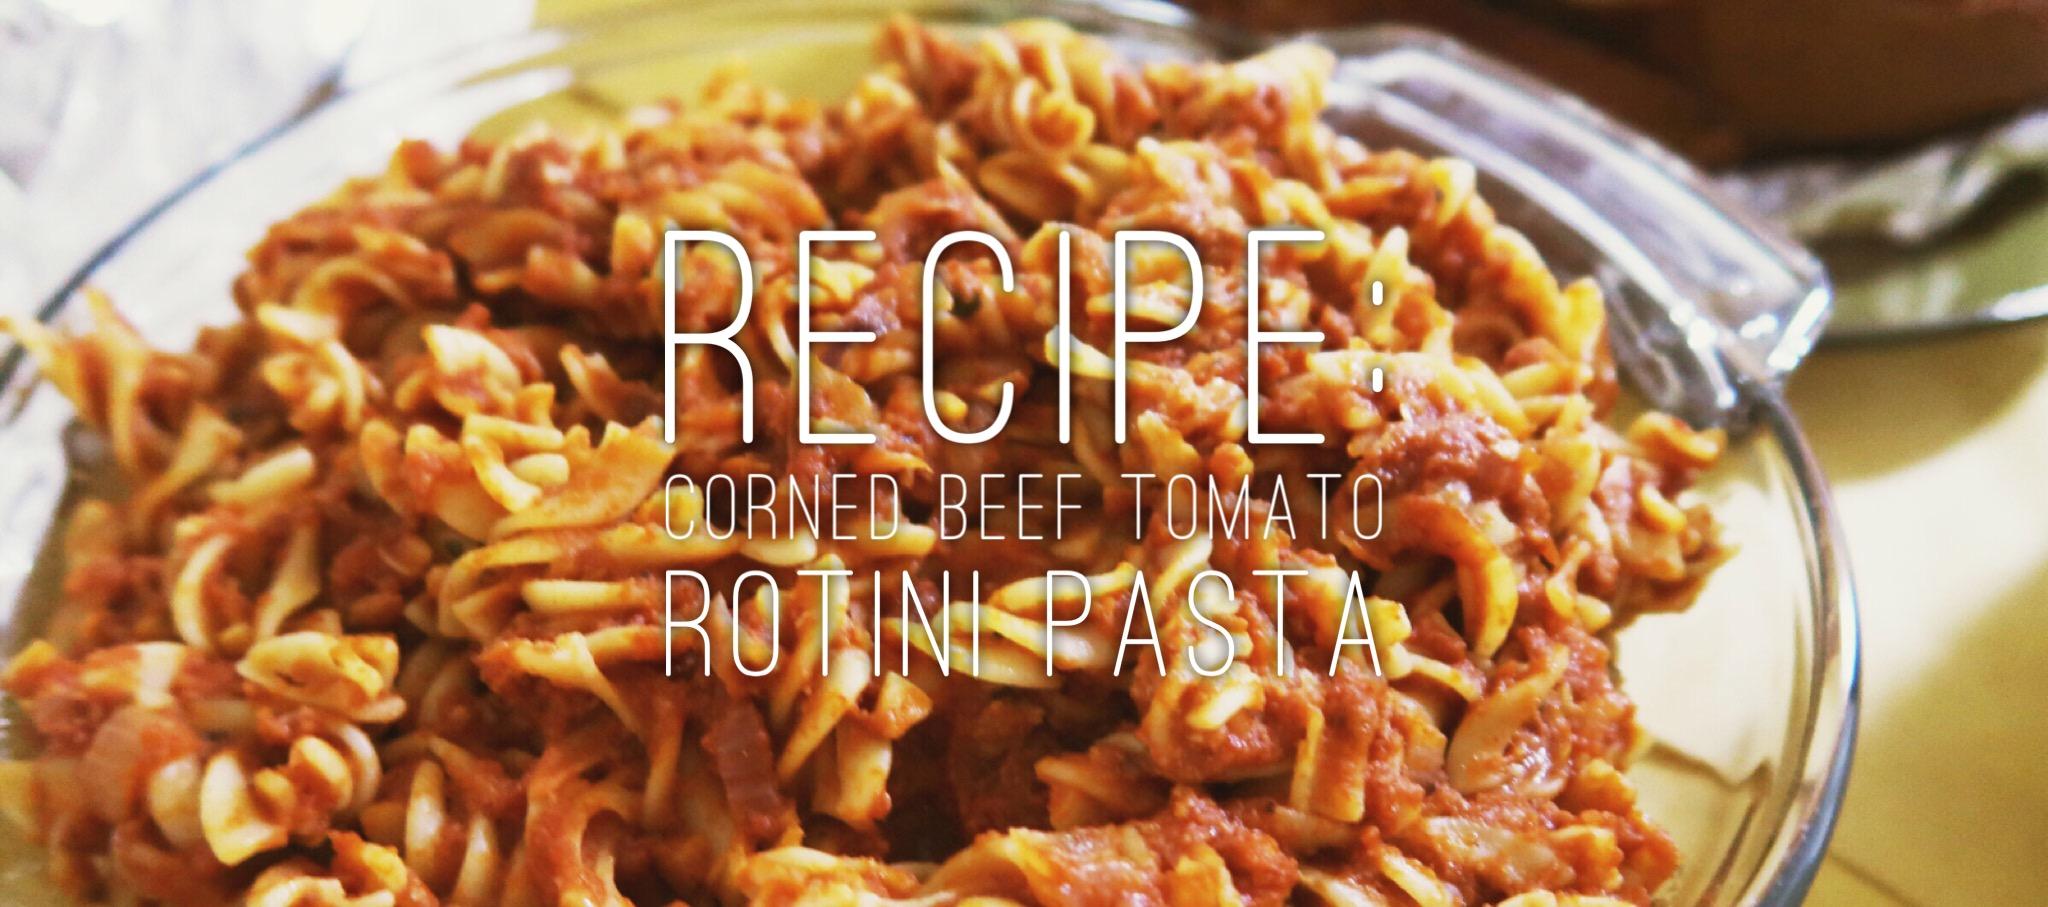 Corned Beef Tomato Rotini Pasta